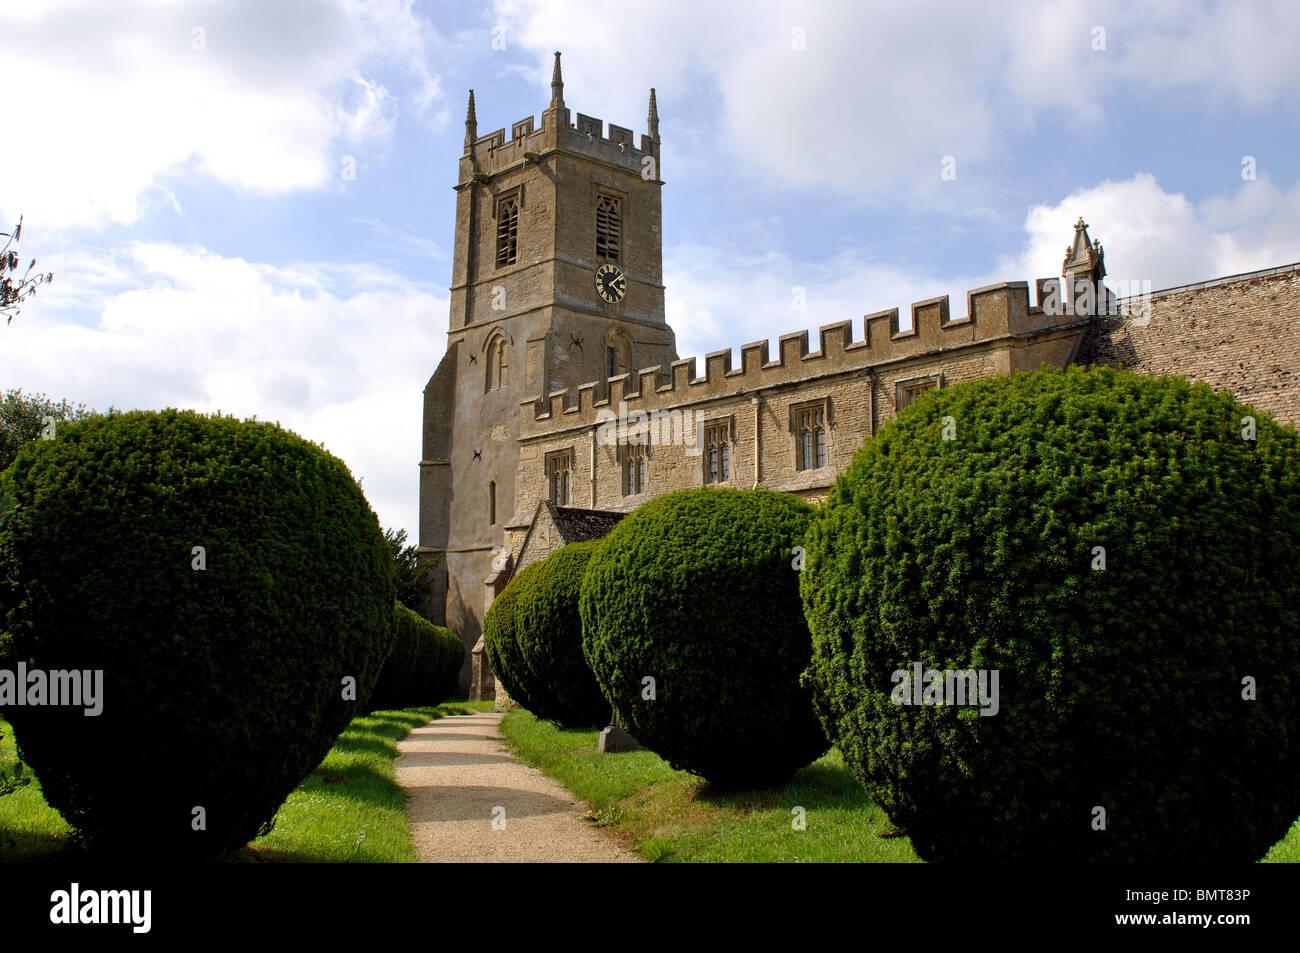 St. Peter and St. Paul Church, Long Compton, Warwickshire, England, UK - Stock Image